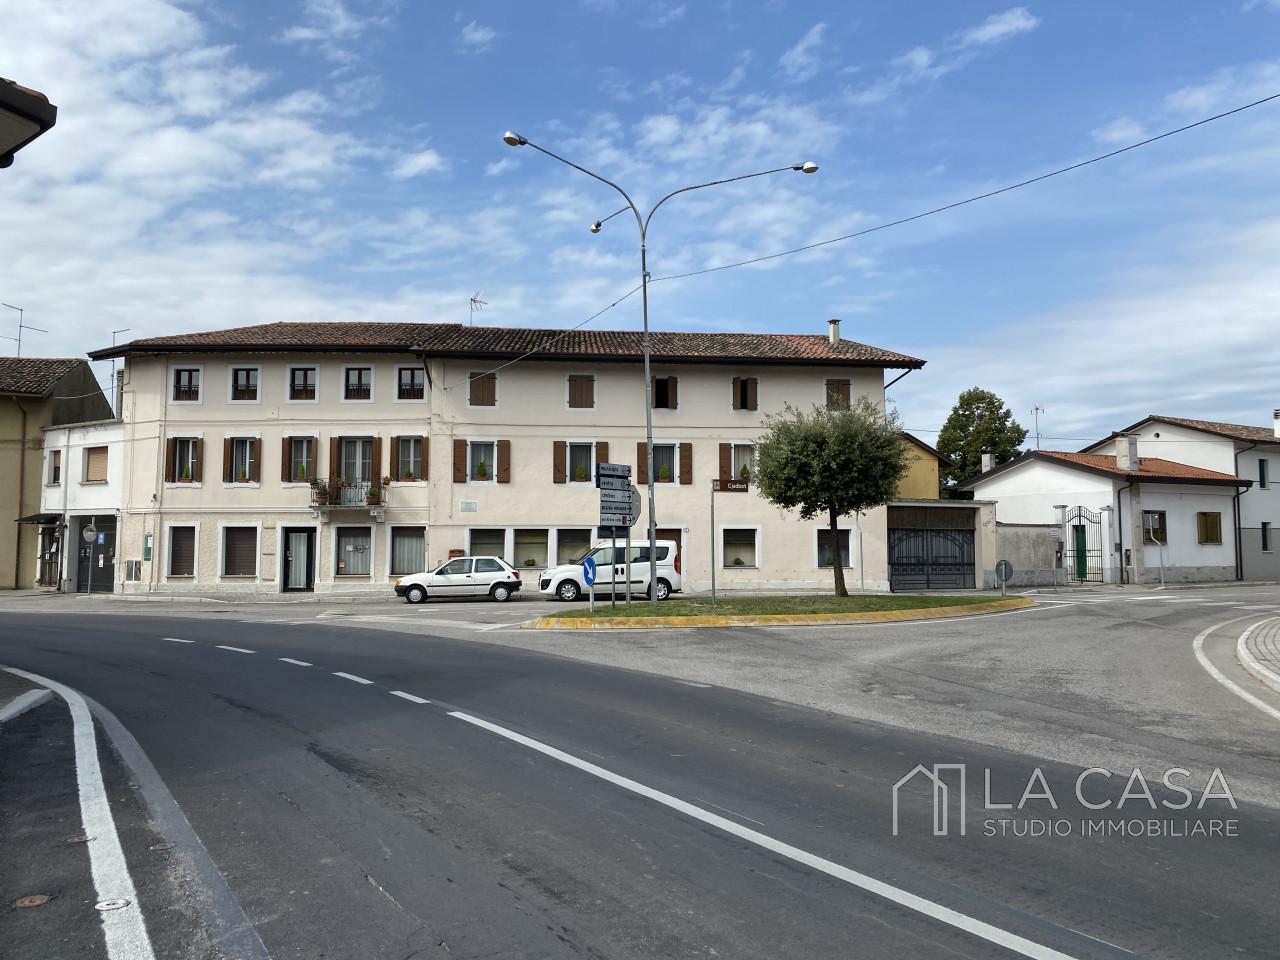 Palazzo plurifamiliare in vendita a Valvasone Arzene - Rif. P3 https://images.gestionaleimmobiliare.it/foto/annunci/200827/2284141/1280x1280/000__img_3741_wmk_0.jpg